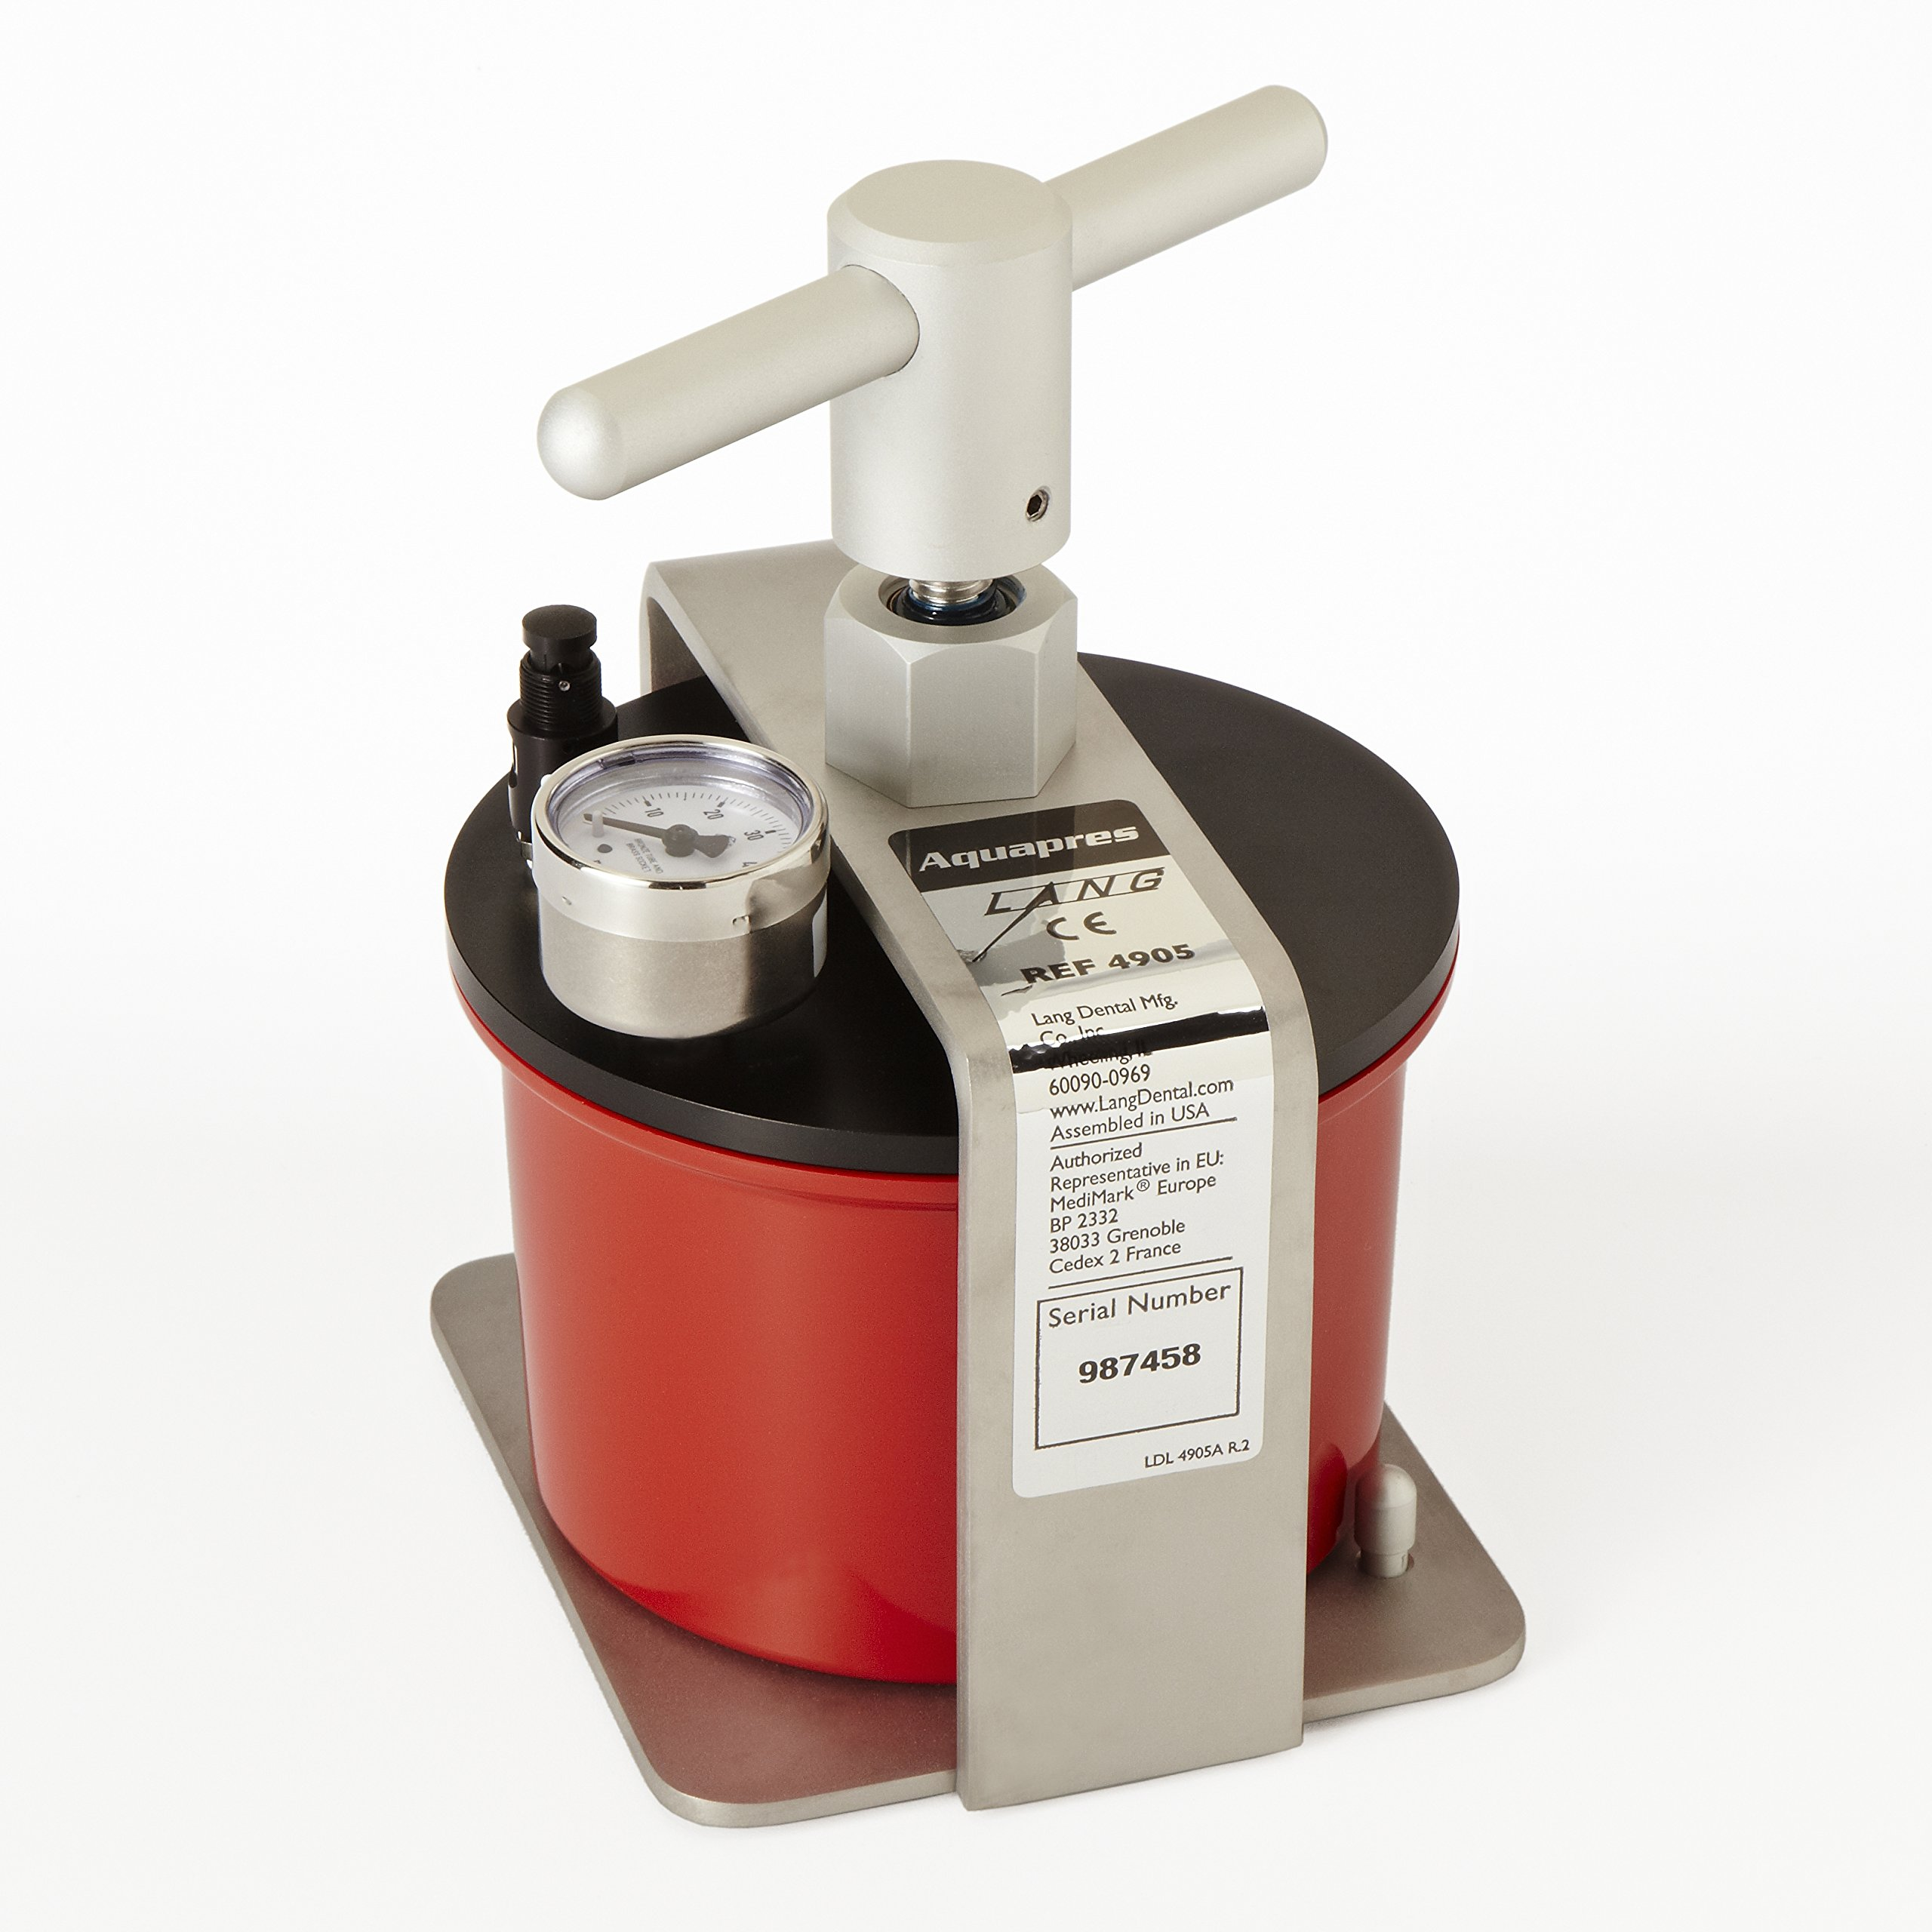 LANG - Aquapres Hydraulic Pressure Curing Unit for Processing self Curing Acrylic resins - # 4905A 114112 Us Dental Depot